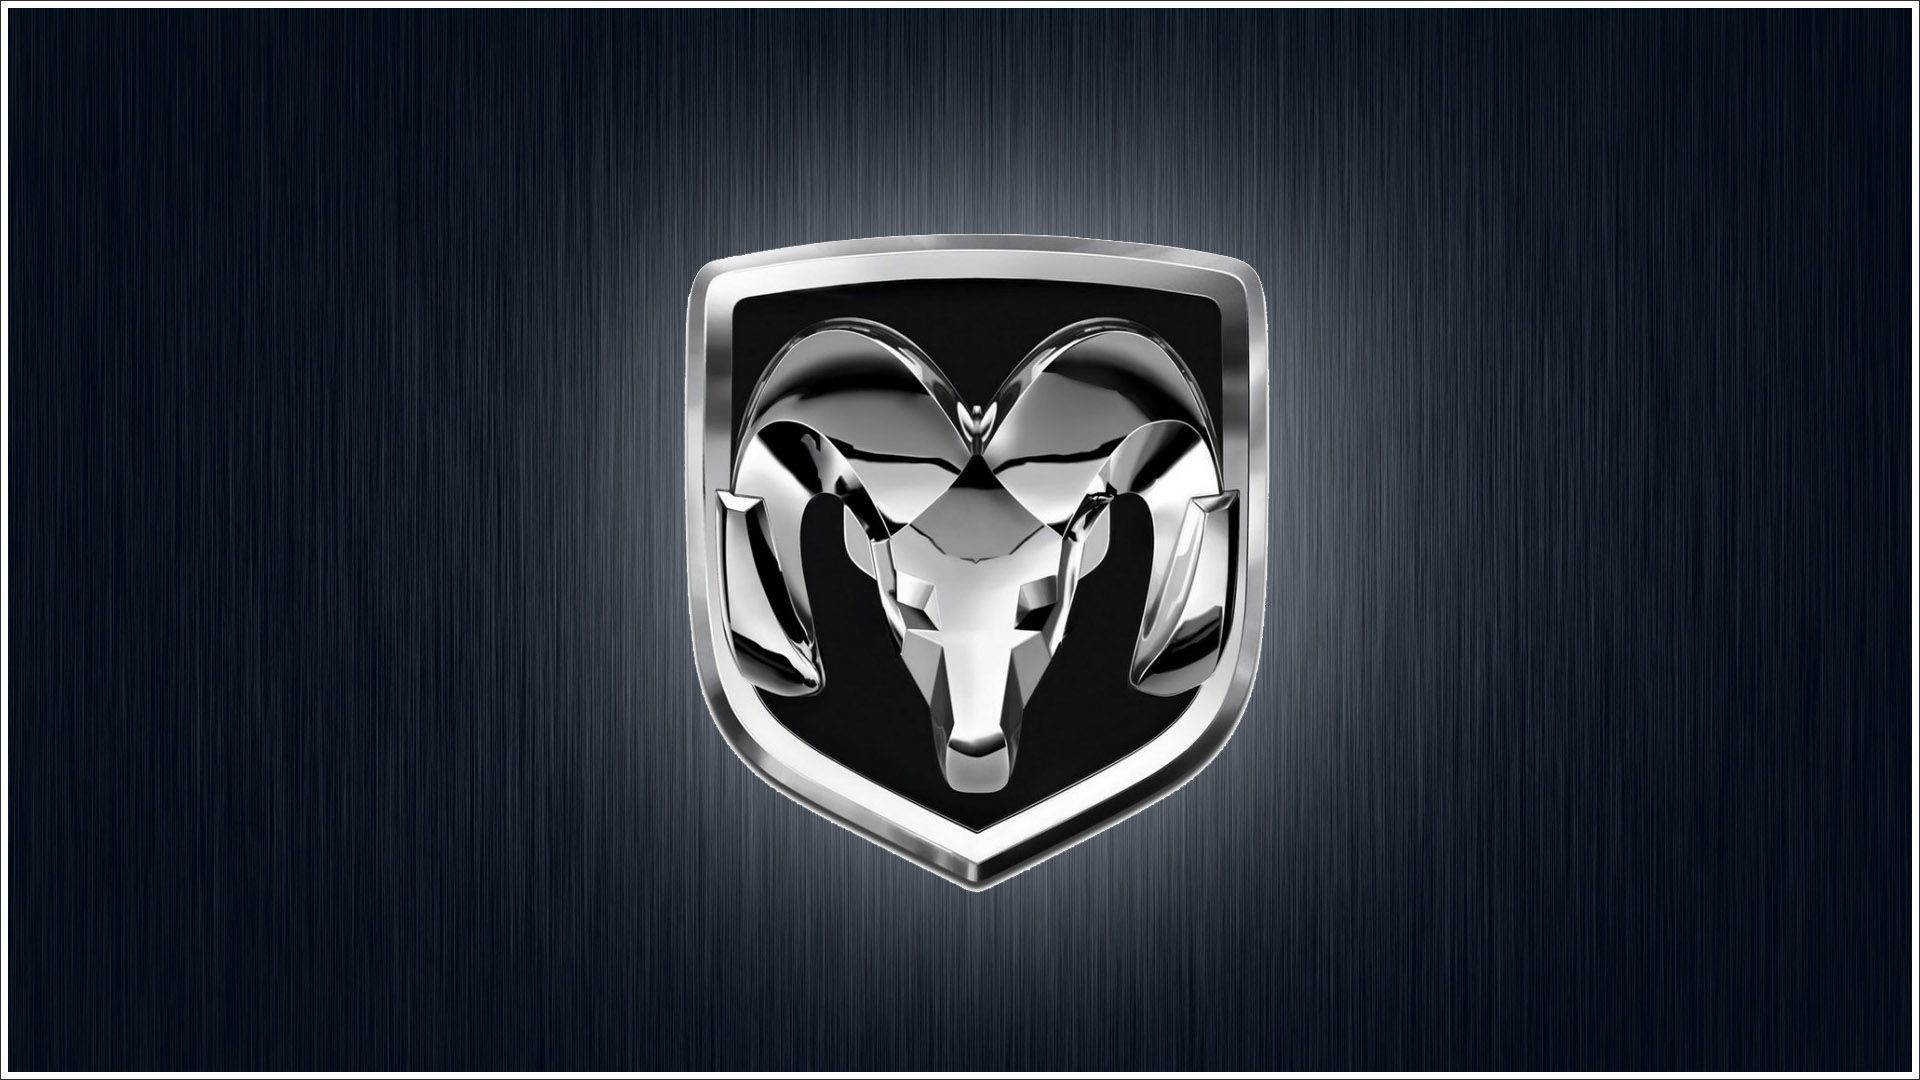 Dodge Ram Wallpaper Hd.